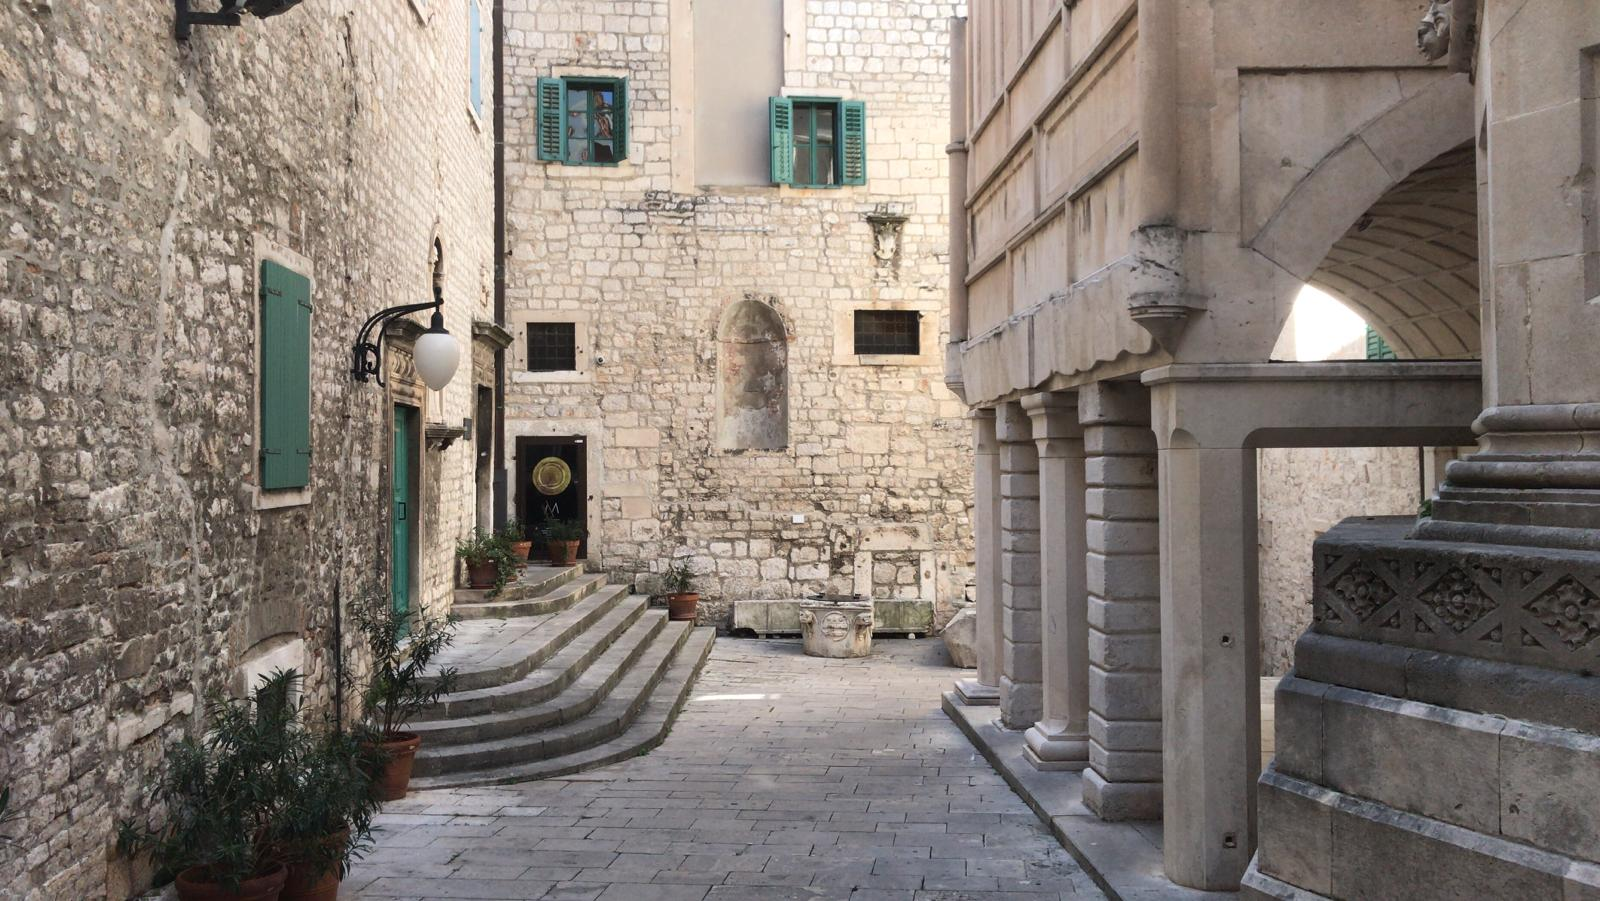 Foto radionica i izložba u sklopu projekta Kairos